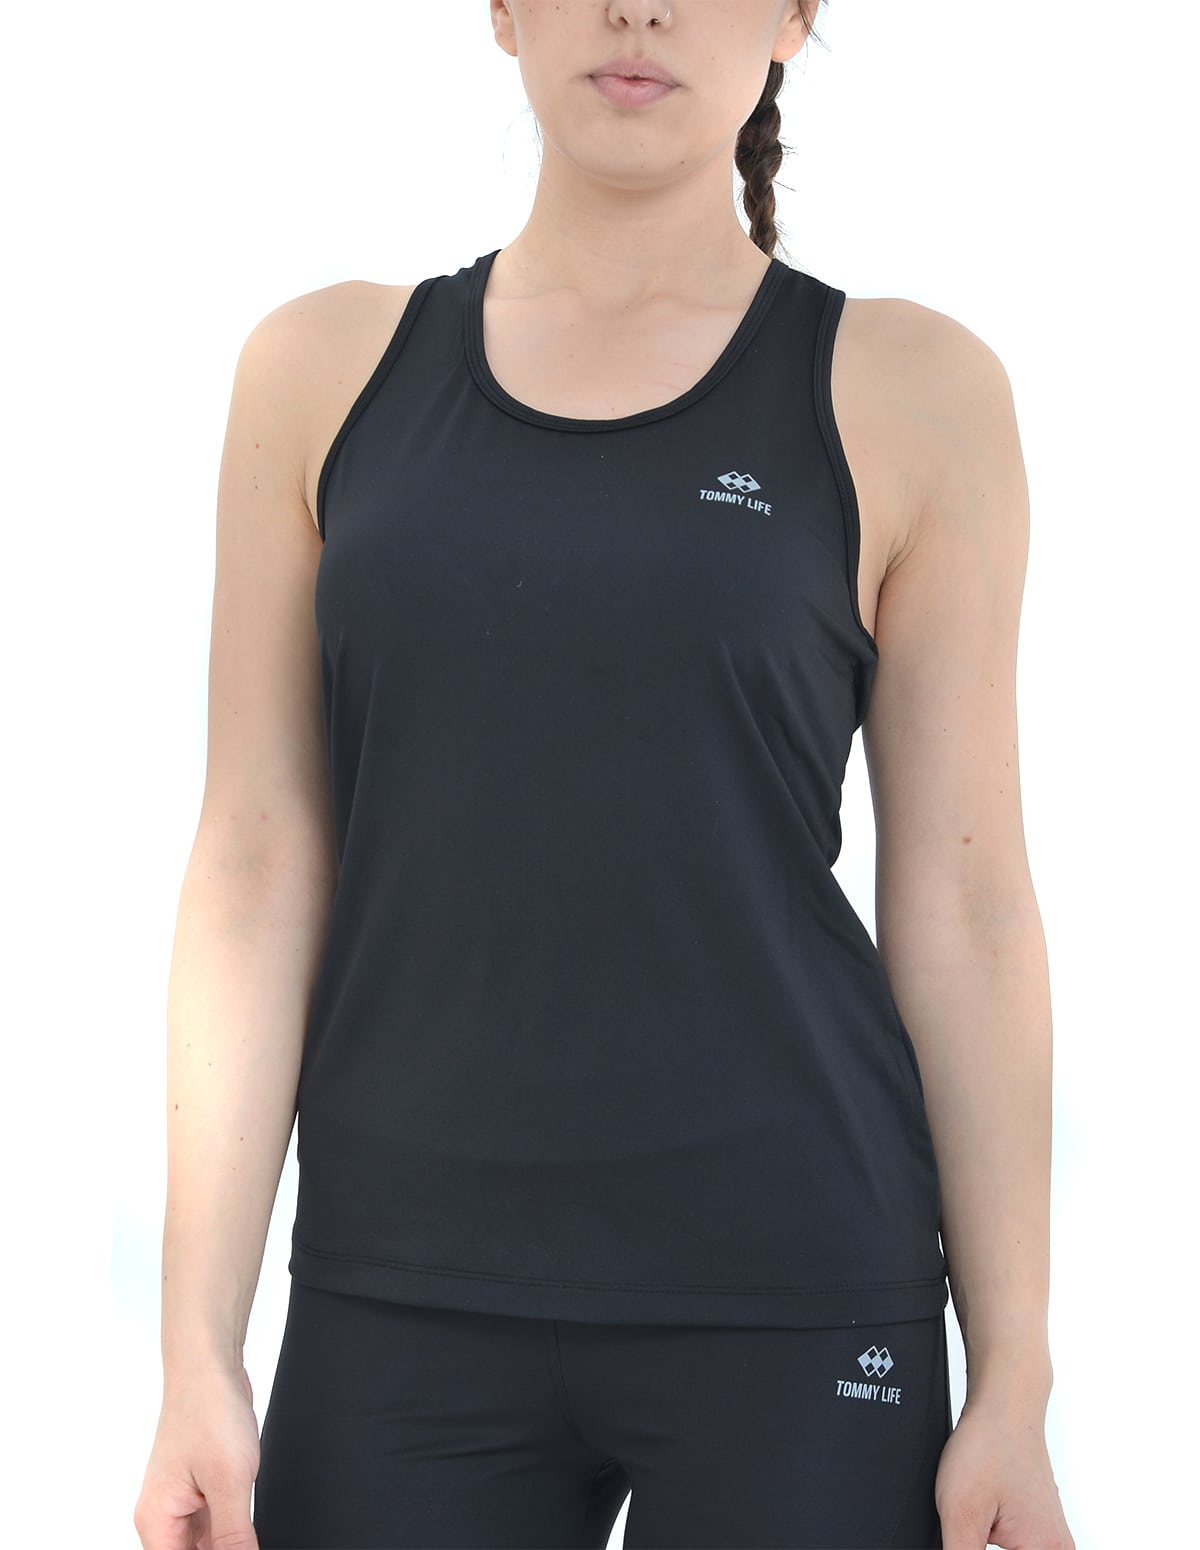 dddda5c20734 Home Γυναικεία T-Shirts και Μπλούζες Γυναικείο αθλητικό μπλουζάκι σε μαύρο  χρώμα